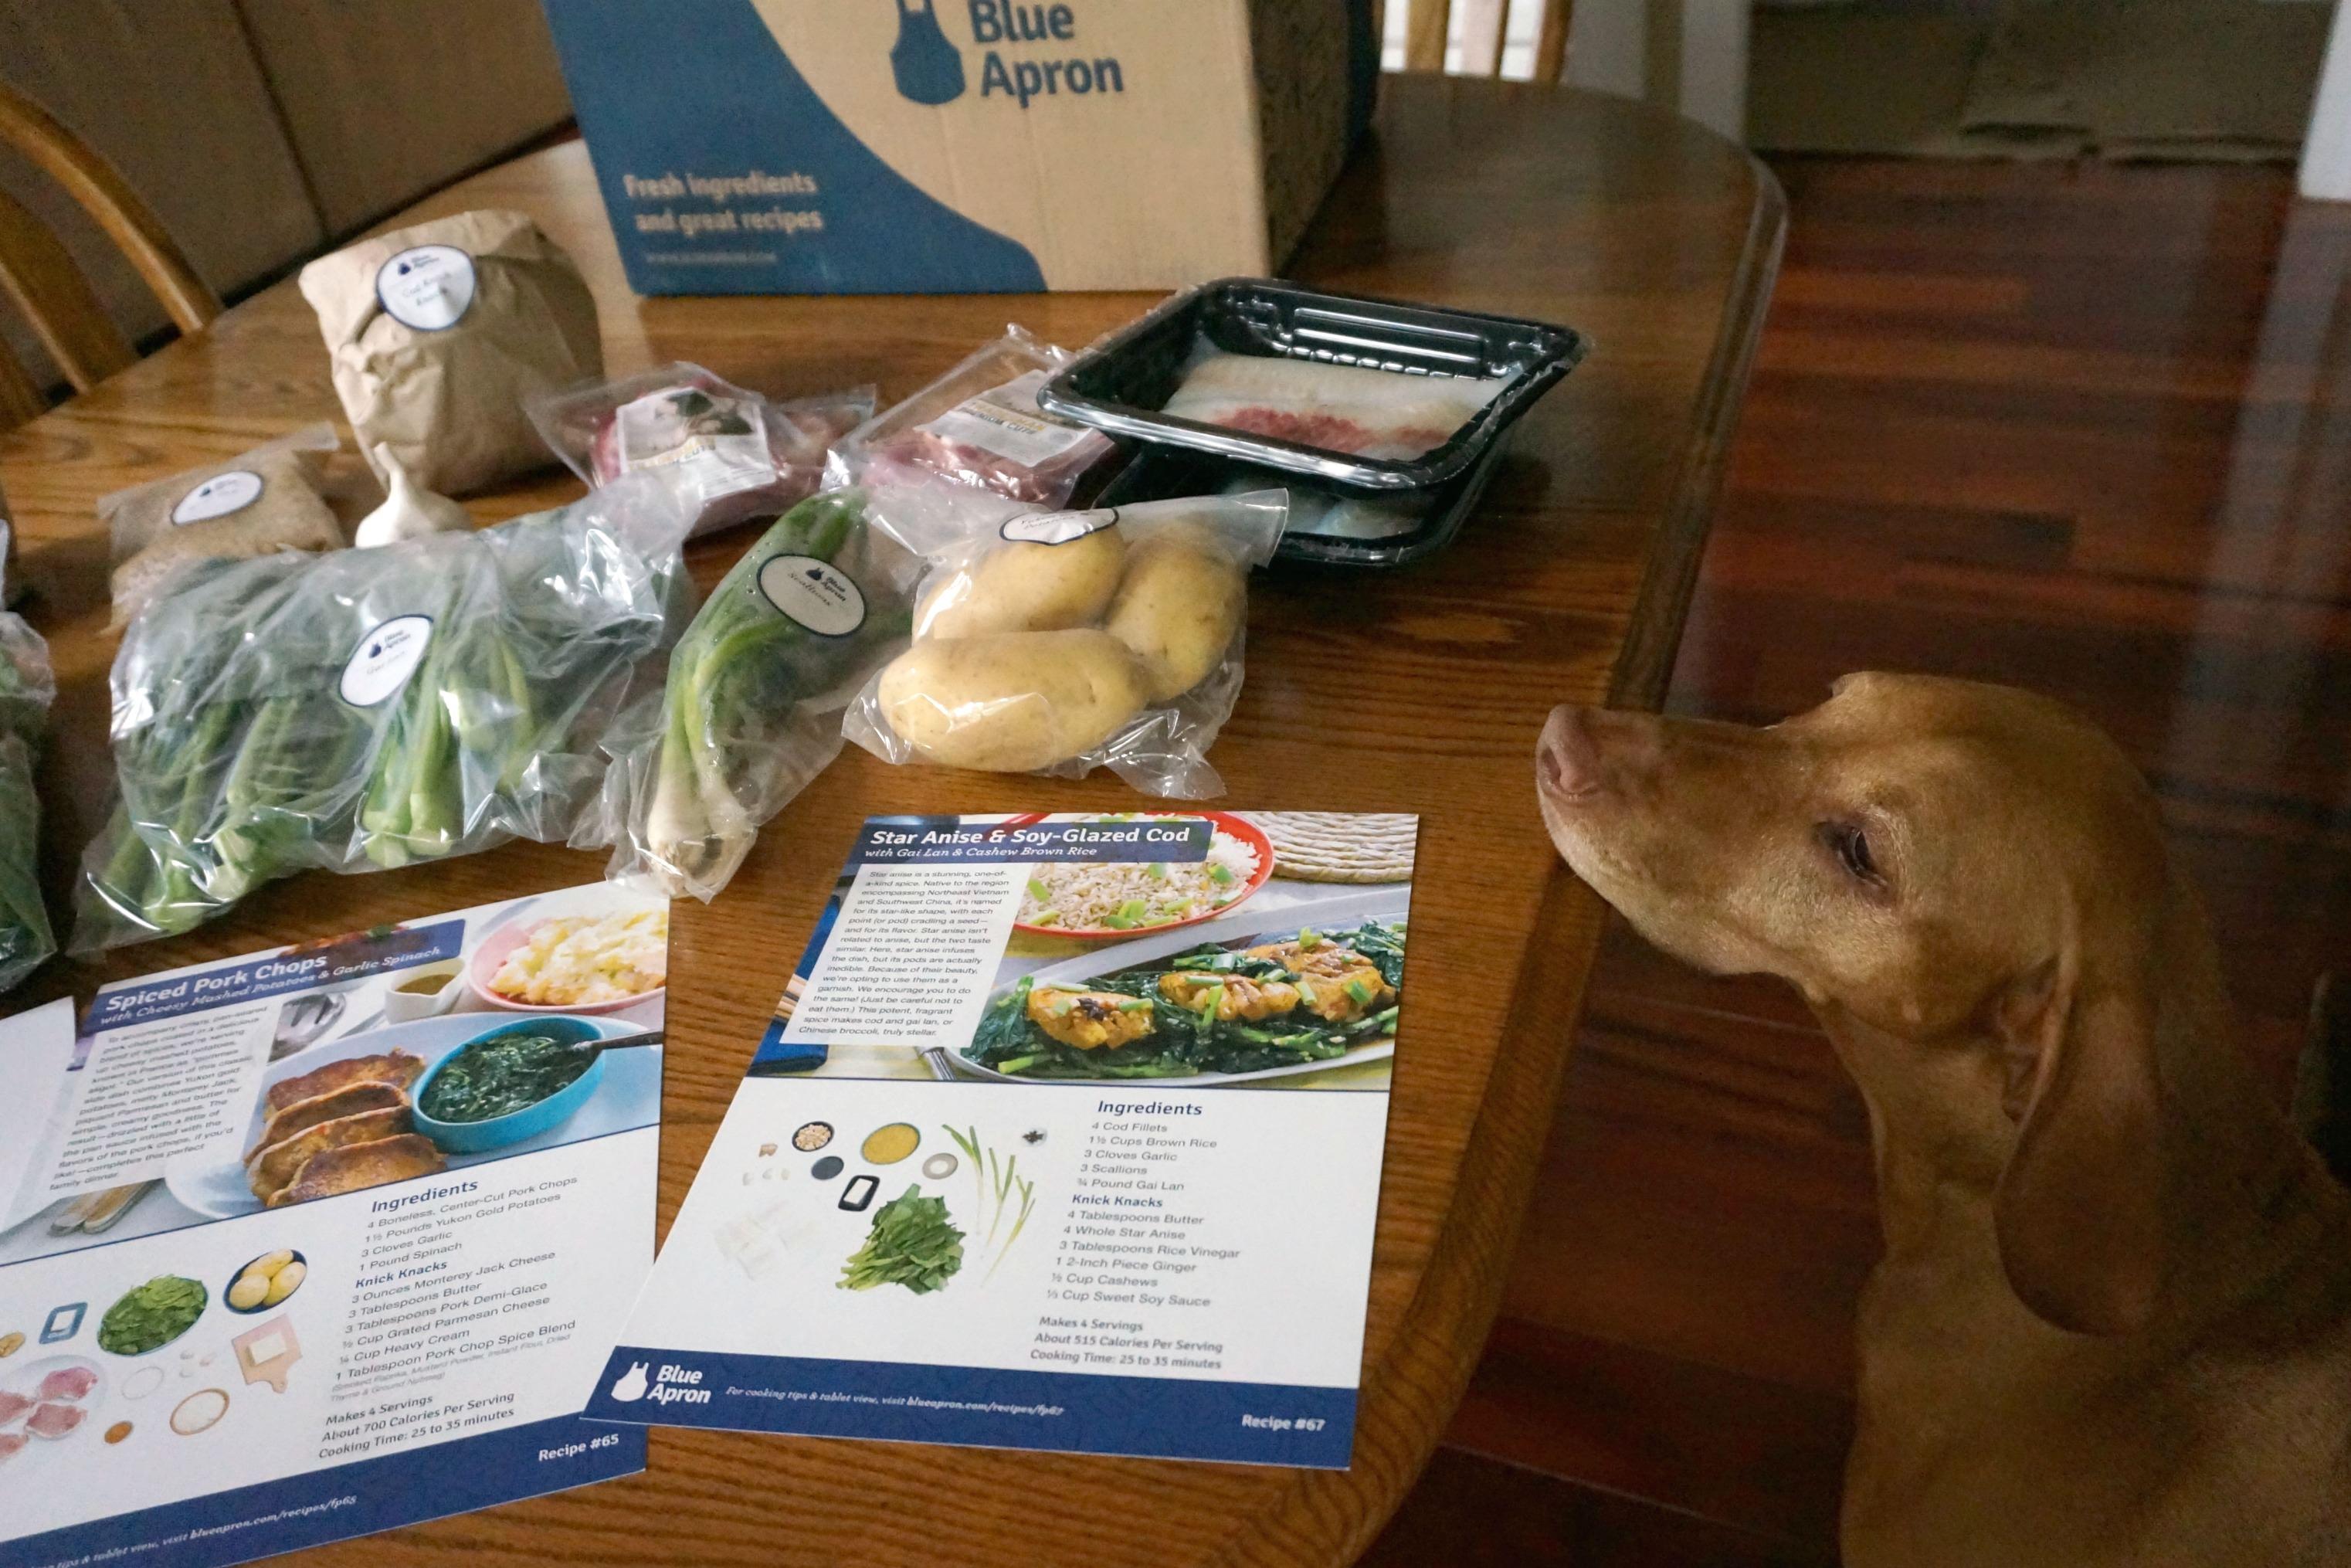 Blue apron omaha - Blue Apron Dog Lover